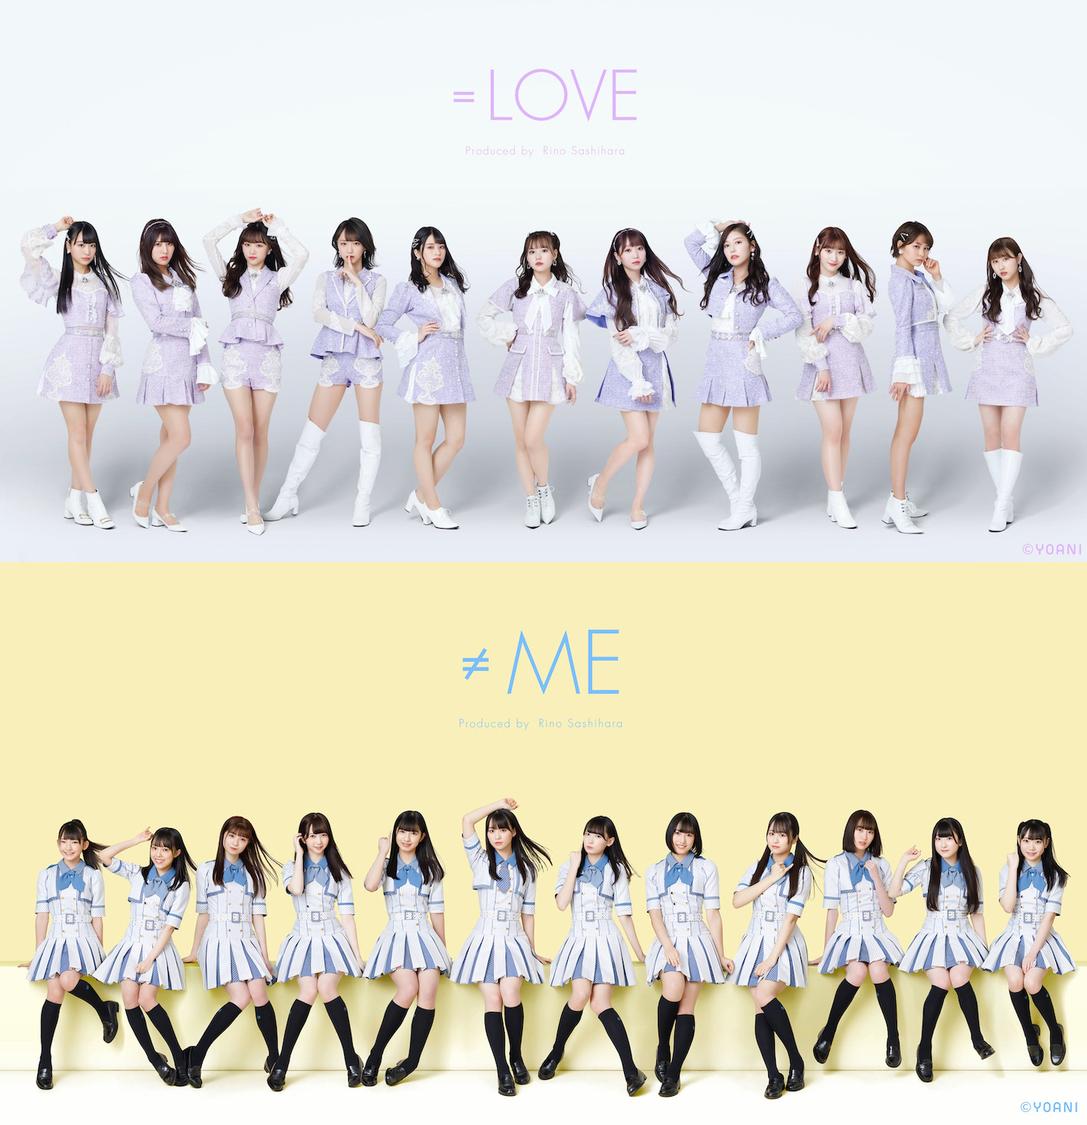 =LOVE&≠ME、スペシャルコンサート<24girls 2020>17LIVEでライブ配信決定!